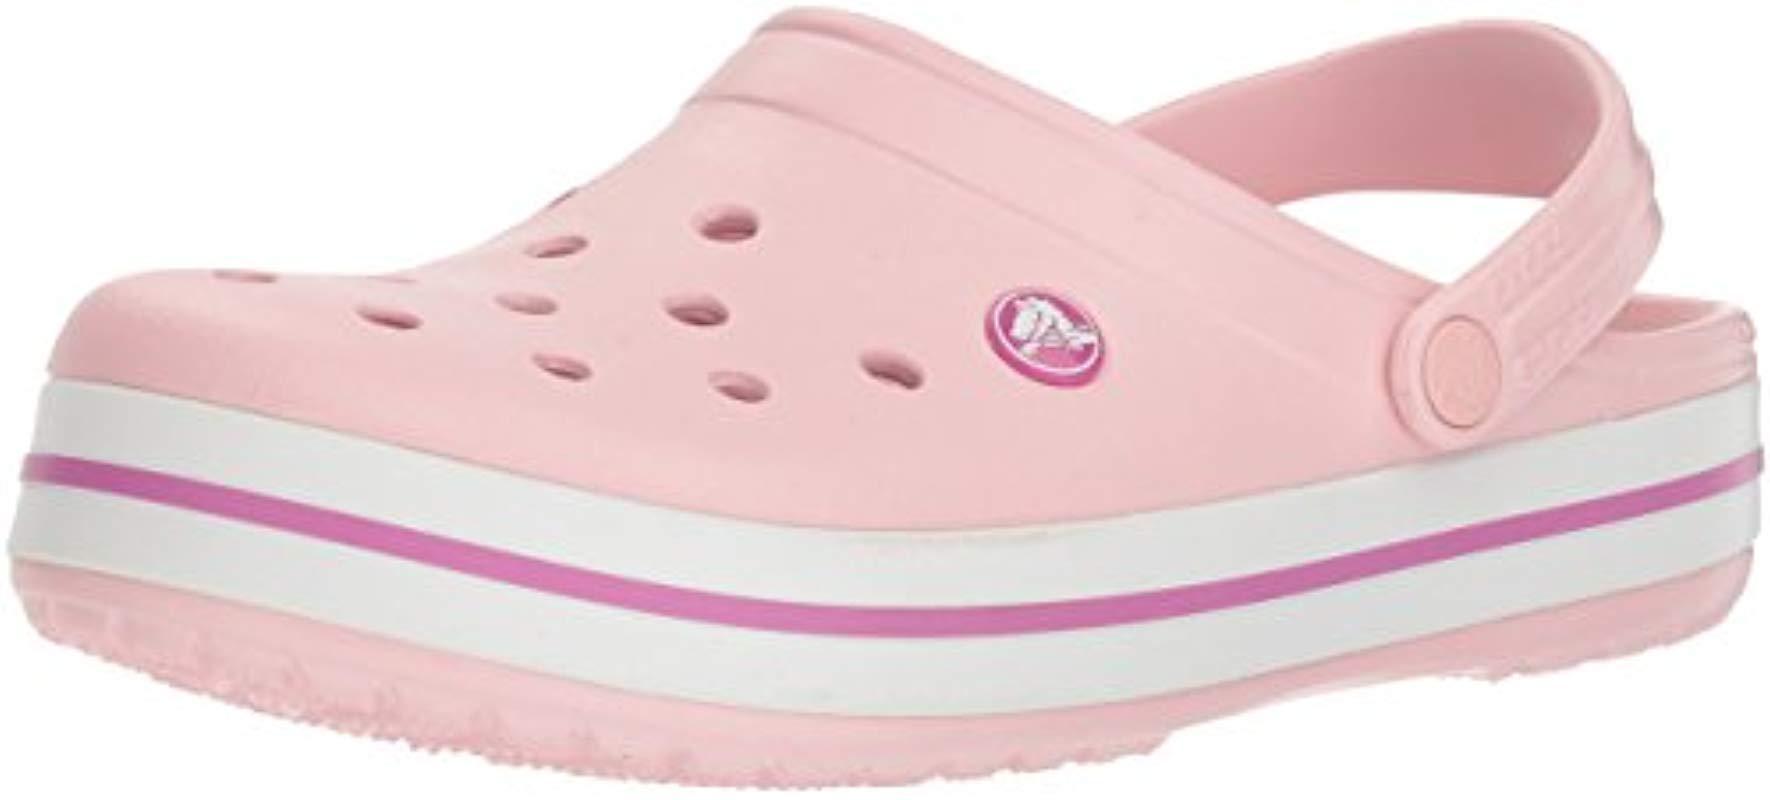 8fe068a81 Crocs™. Women s Pink Crocband Clog ...